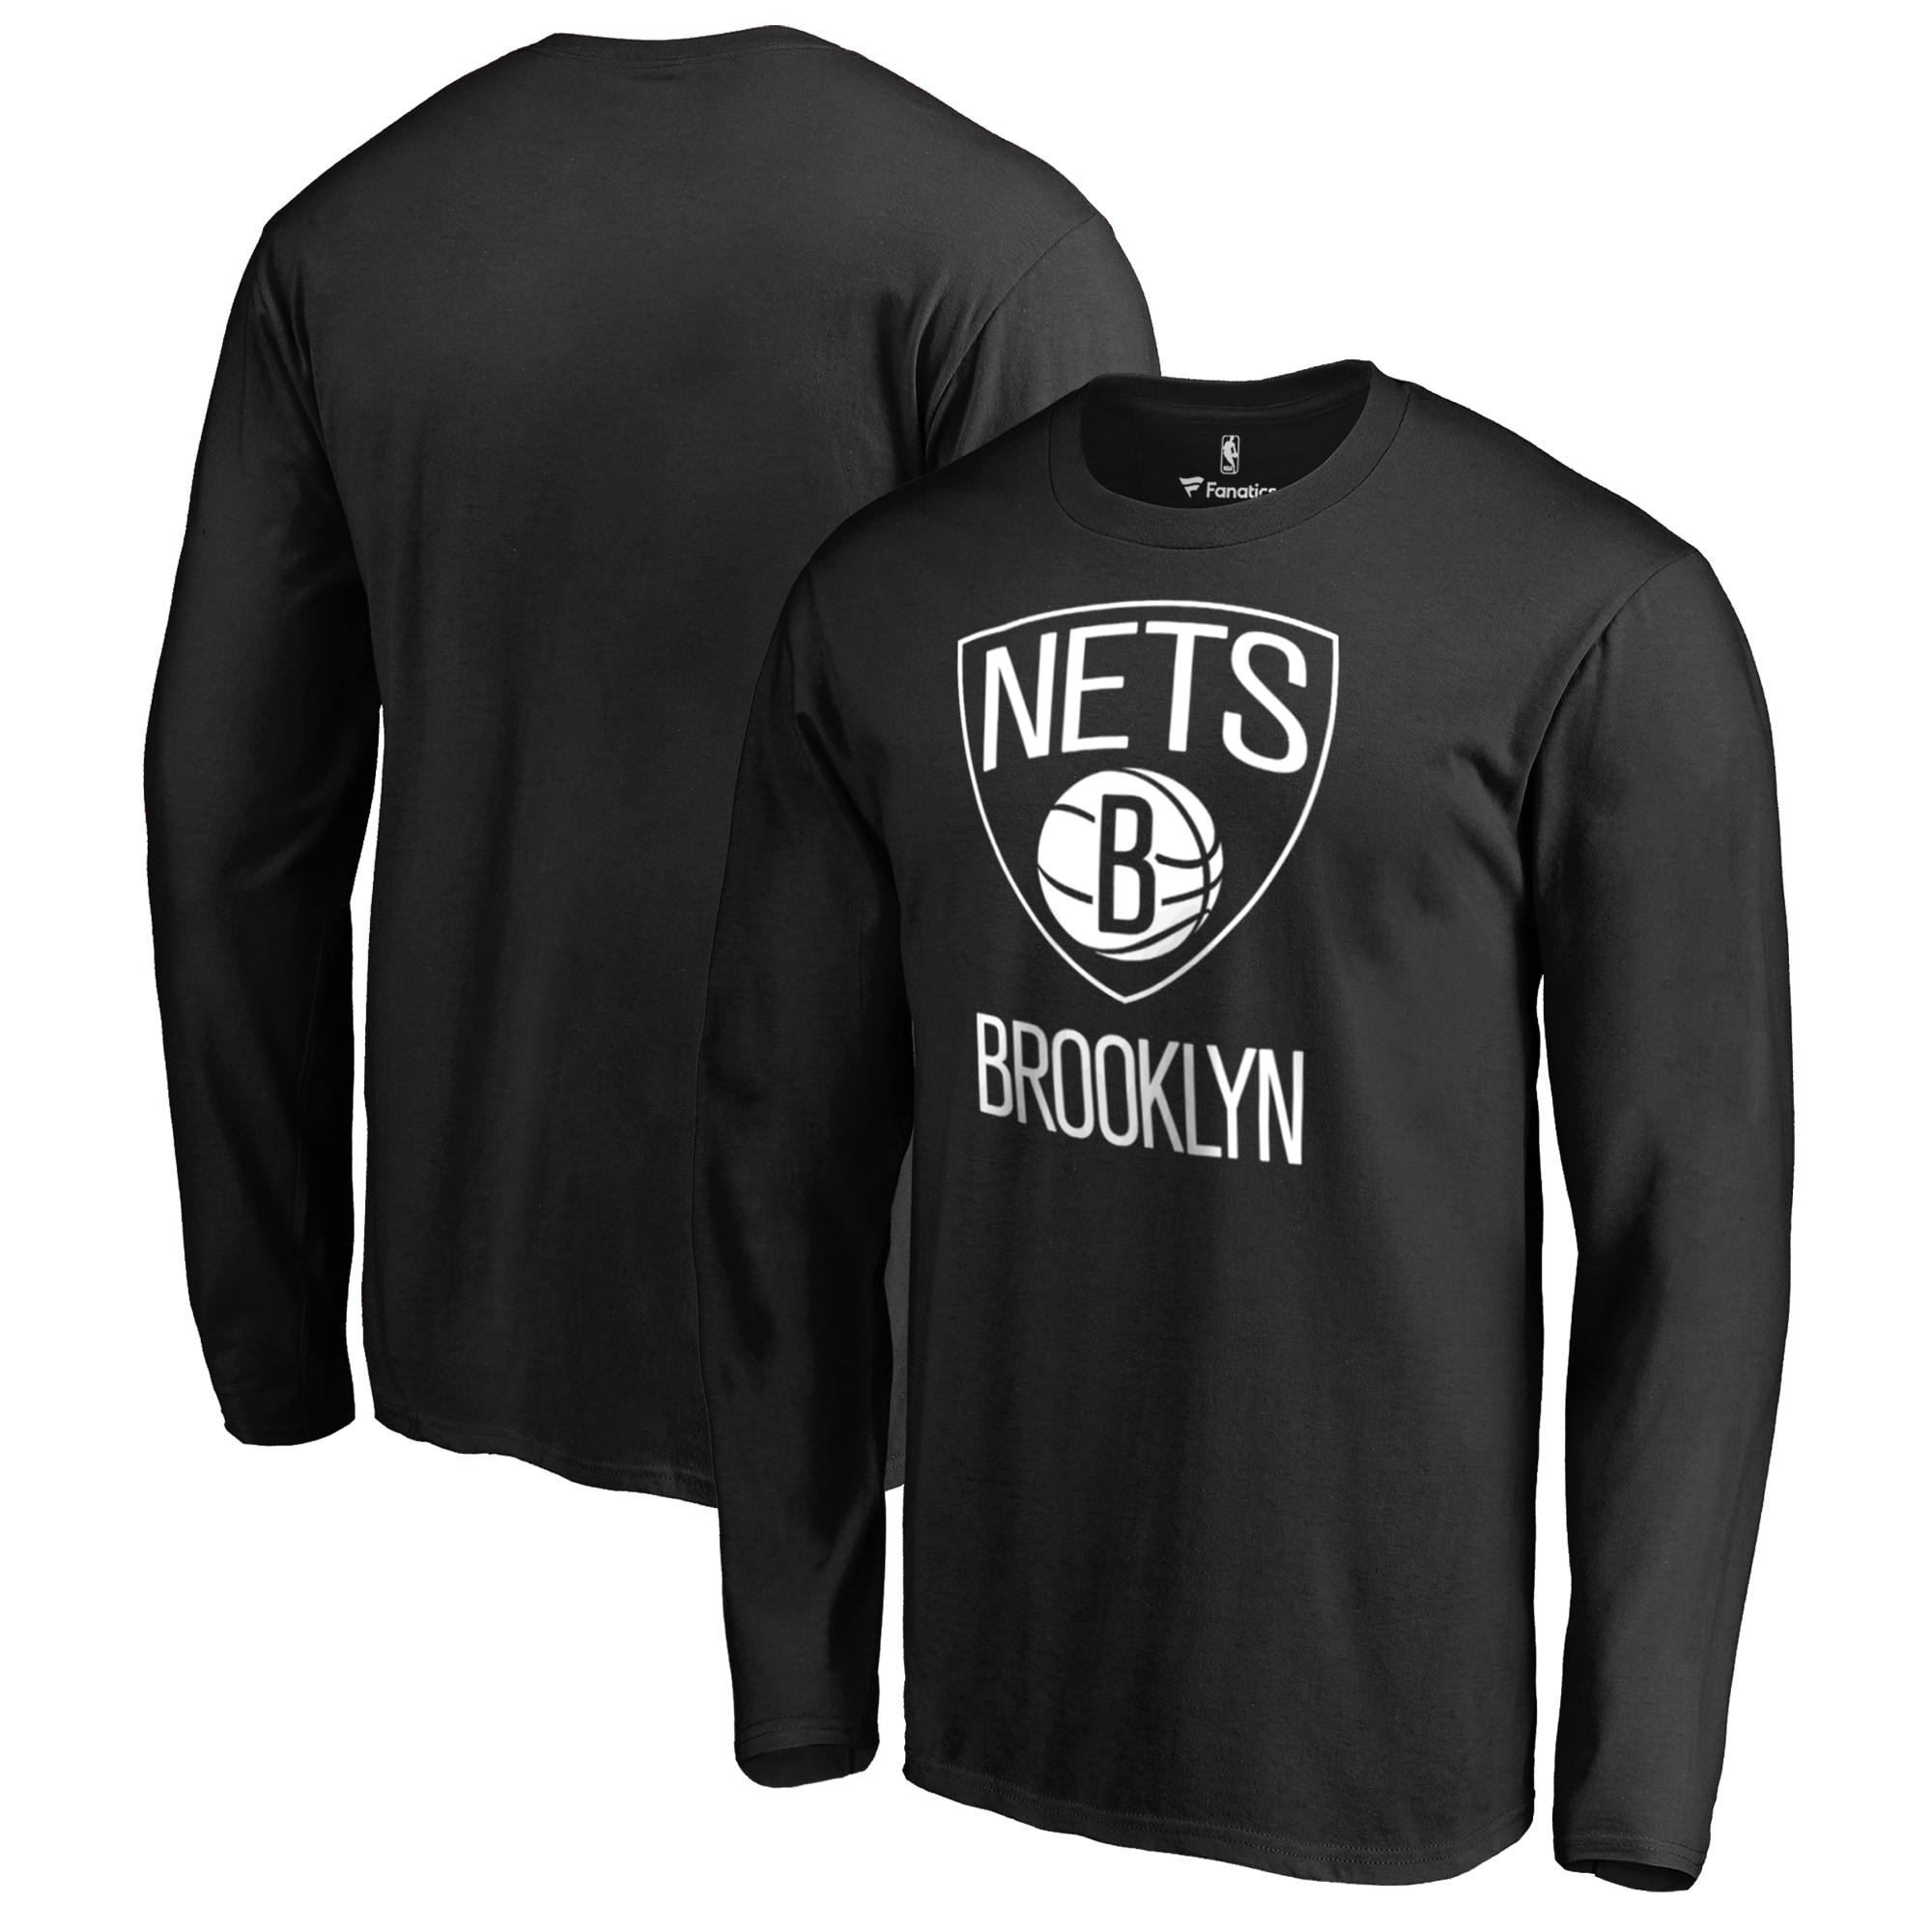 Brooklyn Nets Fanatics Branded Big & Tall Primary Logo Long Sleeve T-Shirt - Black